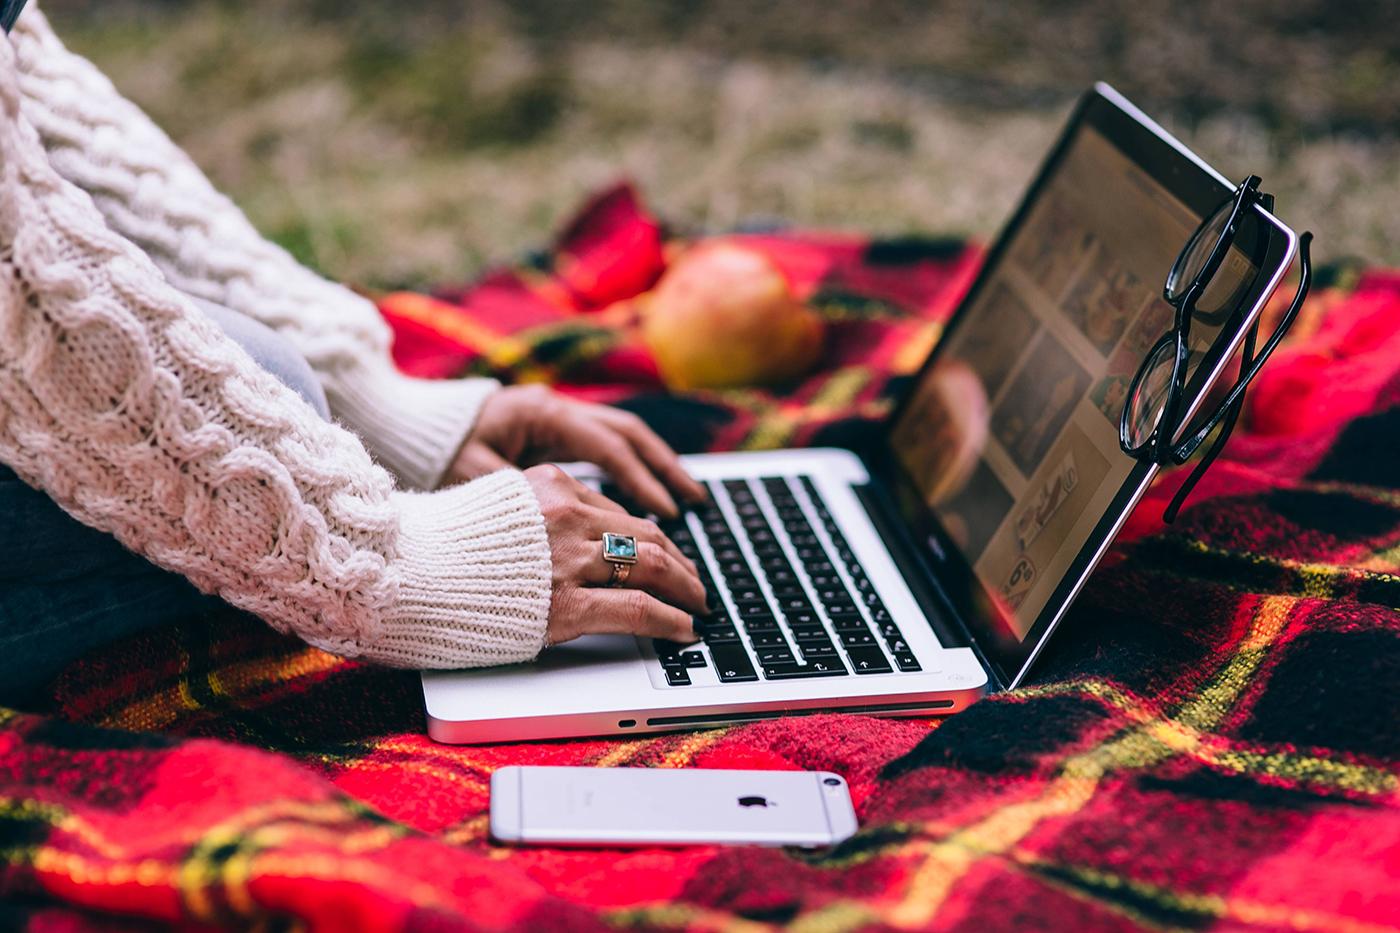 Entrepreneur using laptop on rug